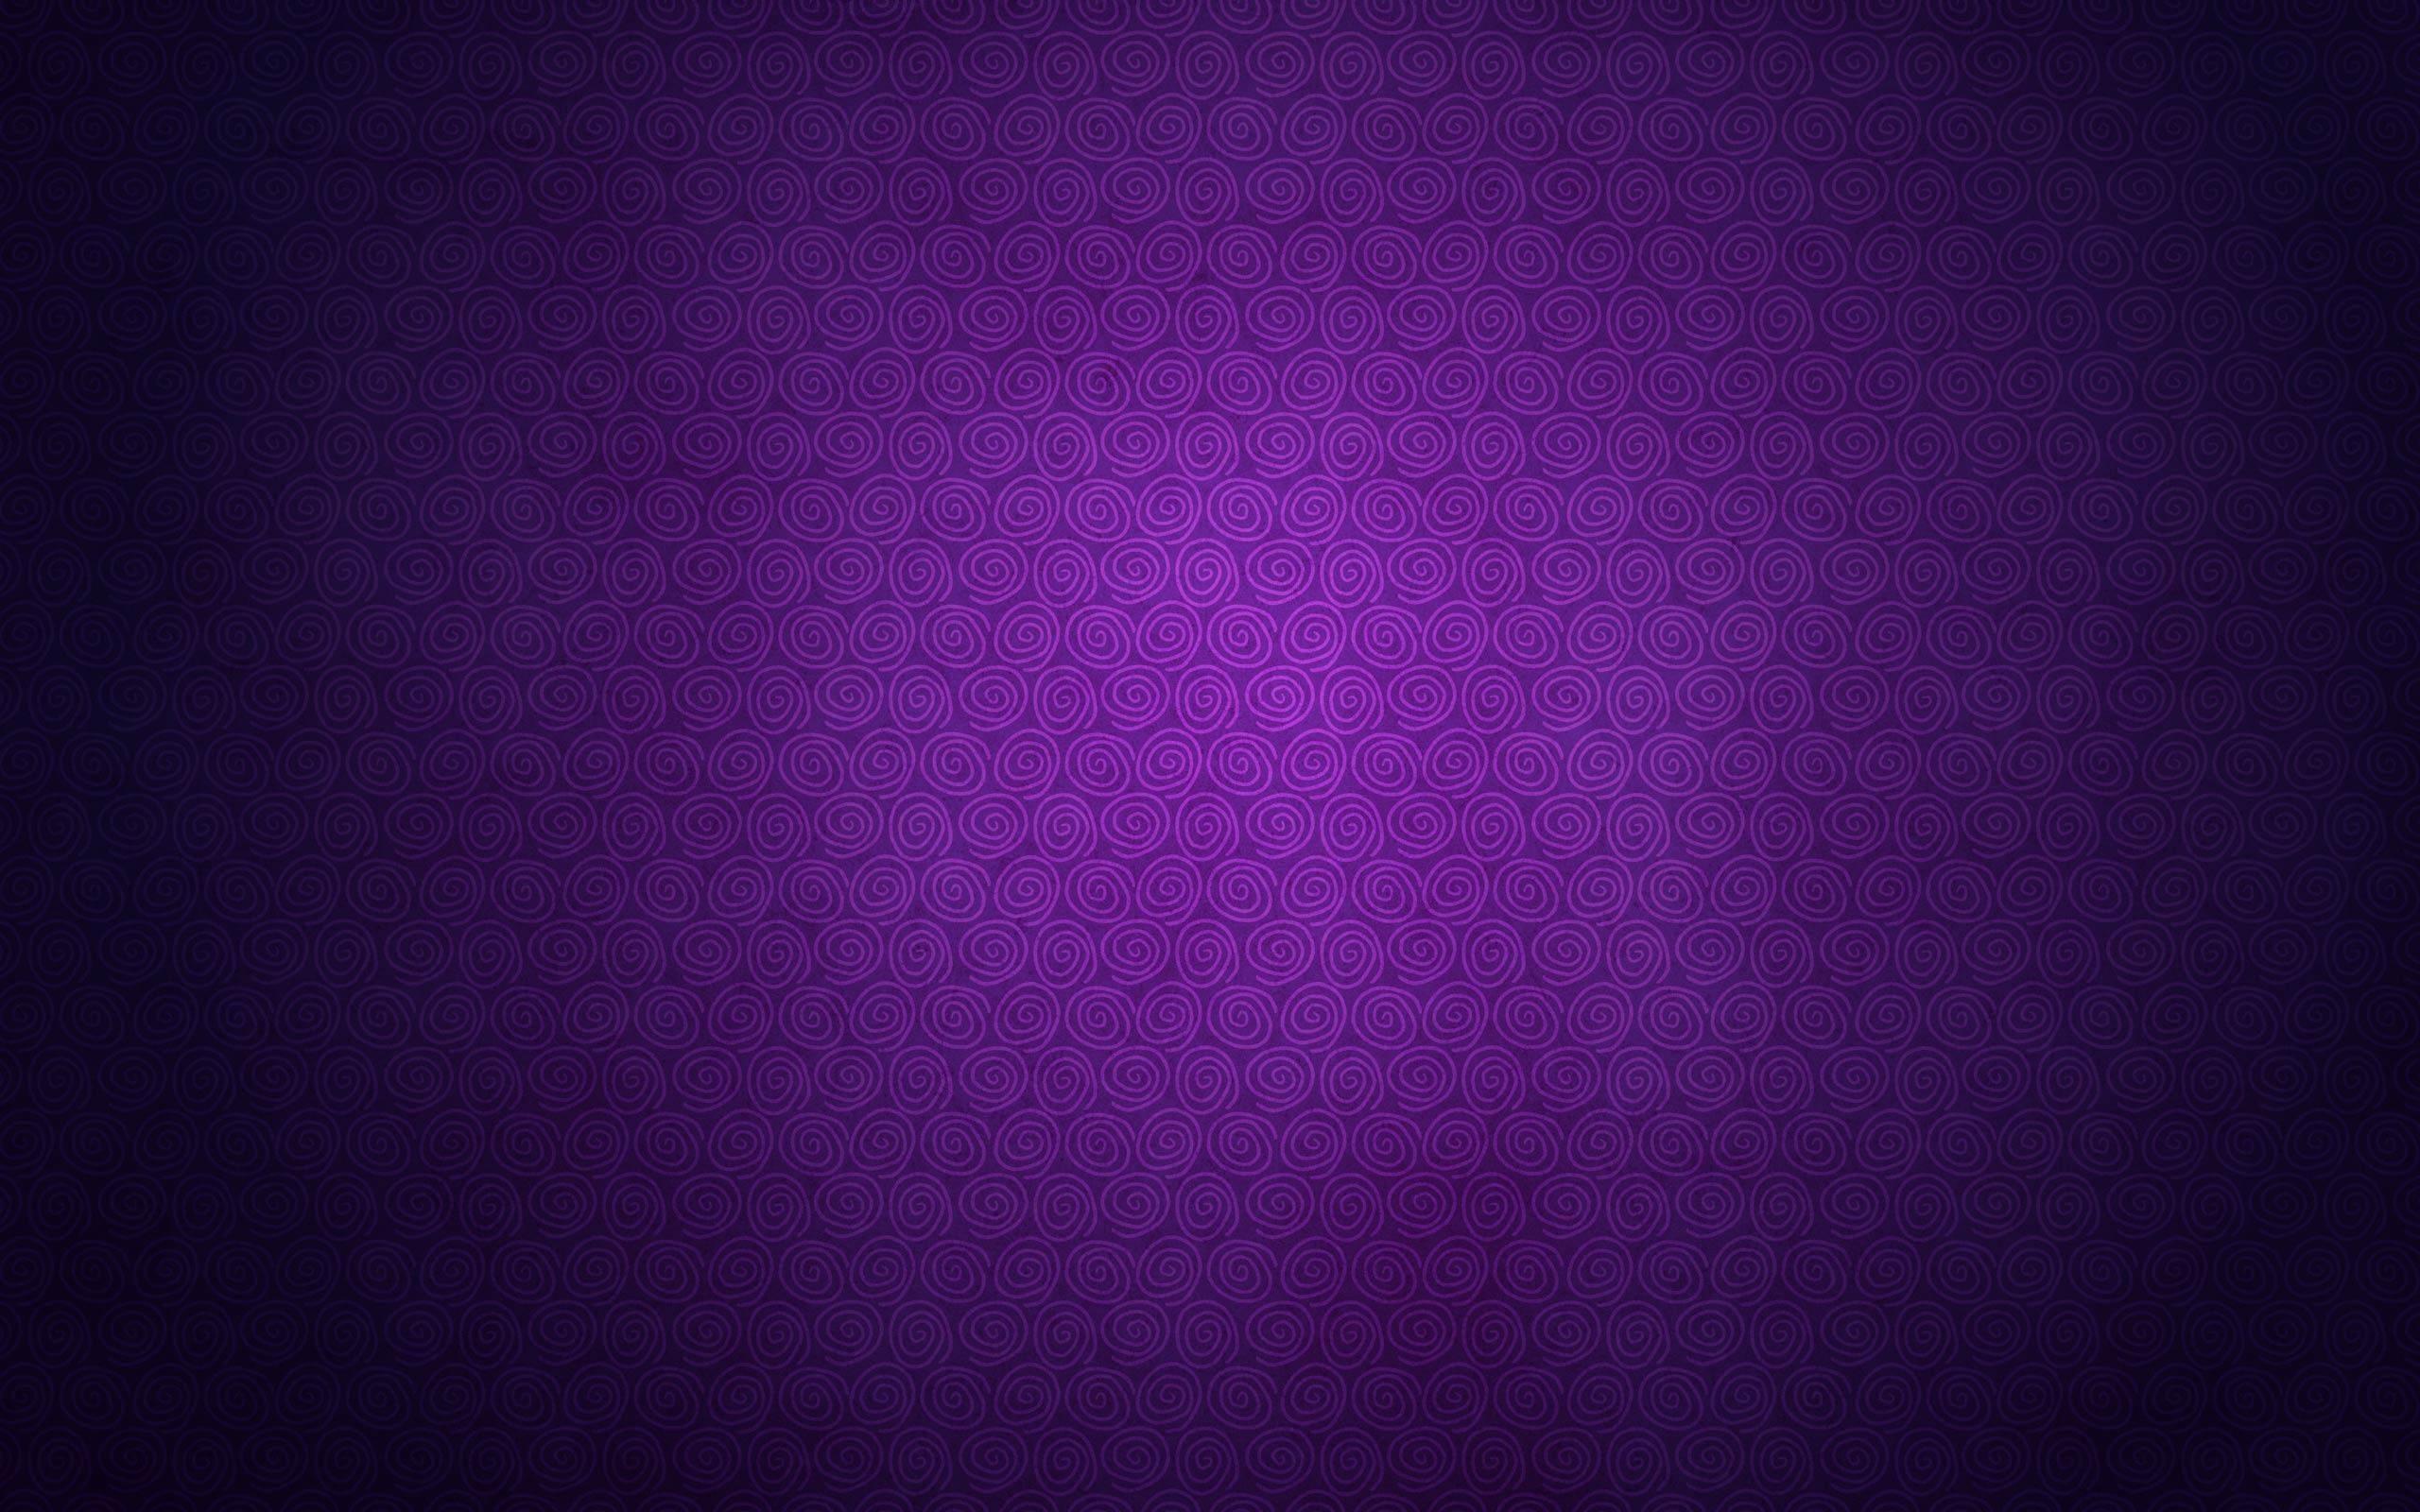 Amazing Wallpaper Macbook Purple - 1109148-best-purple-wallpaper-for-computer-2560x1600-for-tablet  Image_96815.jpg